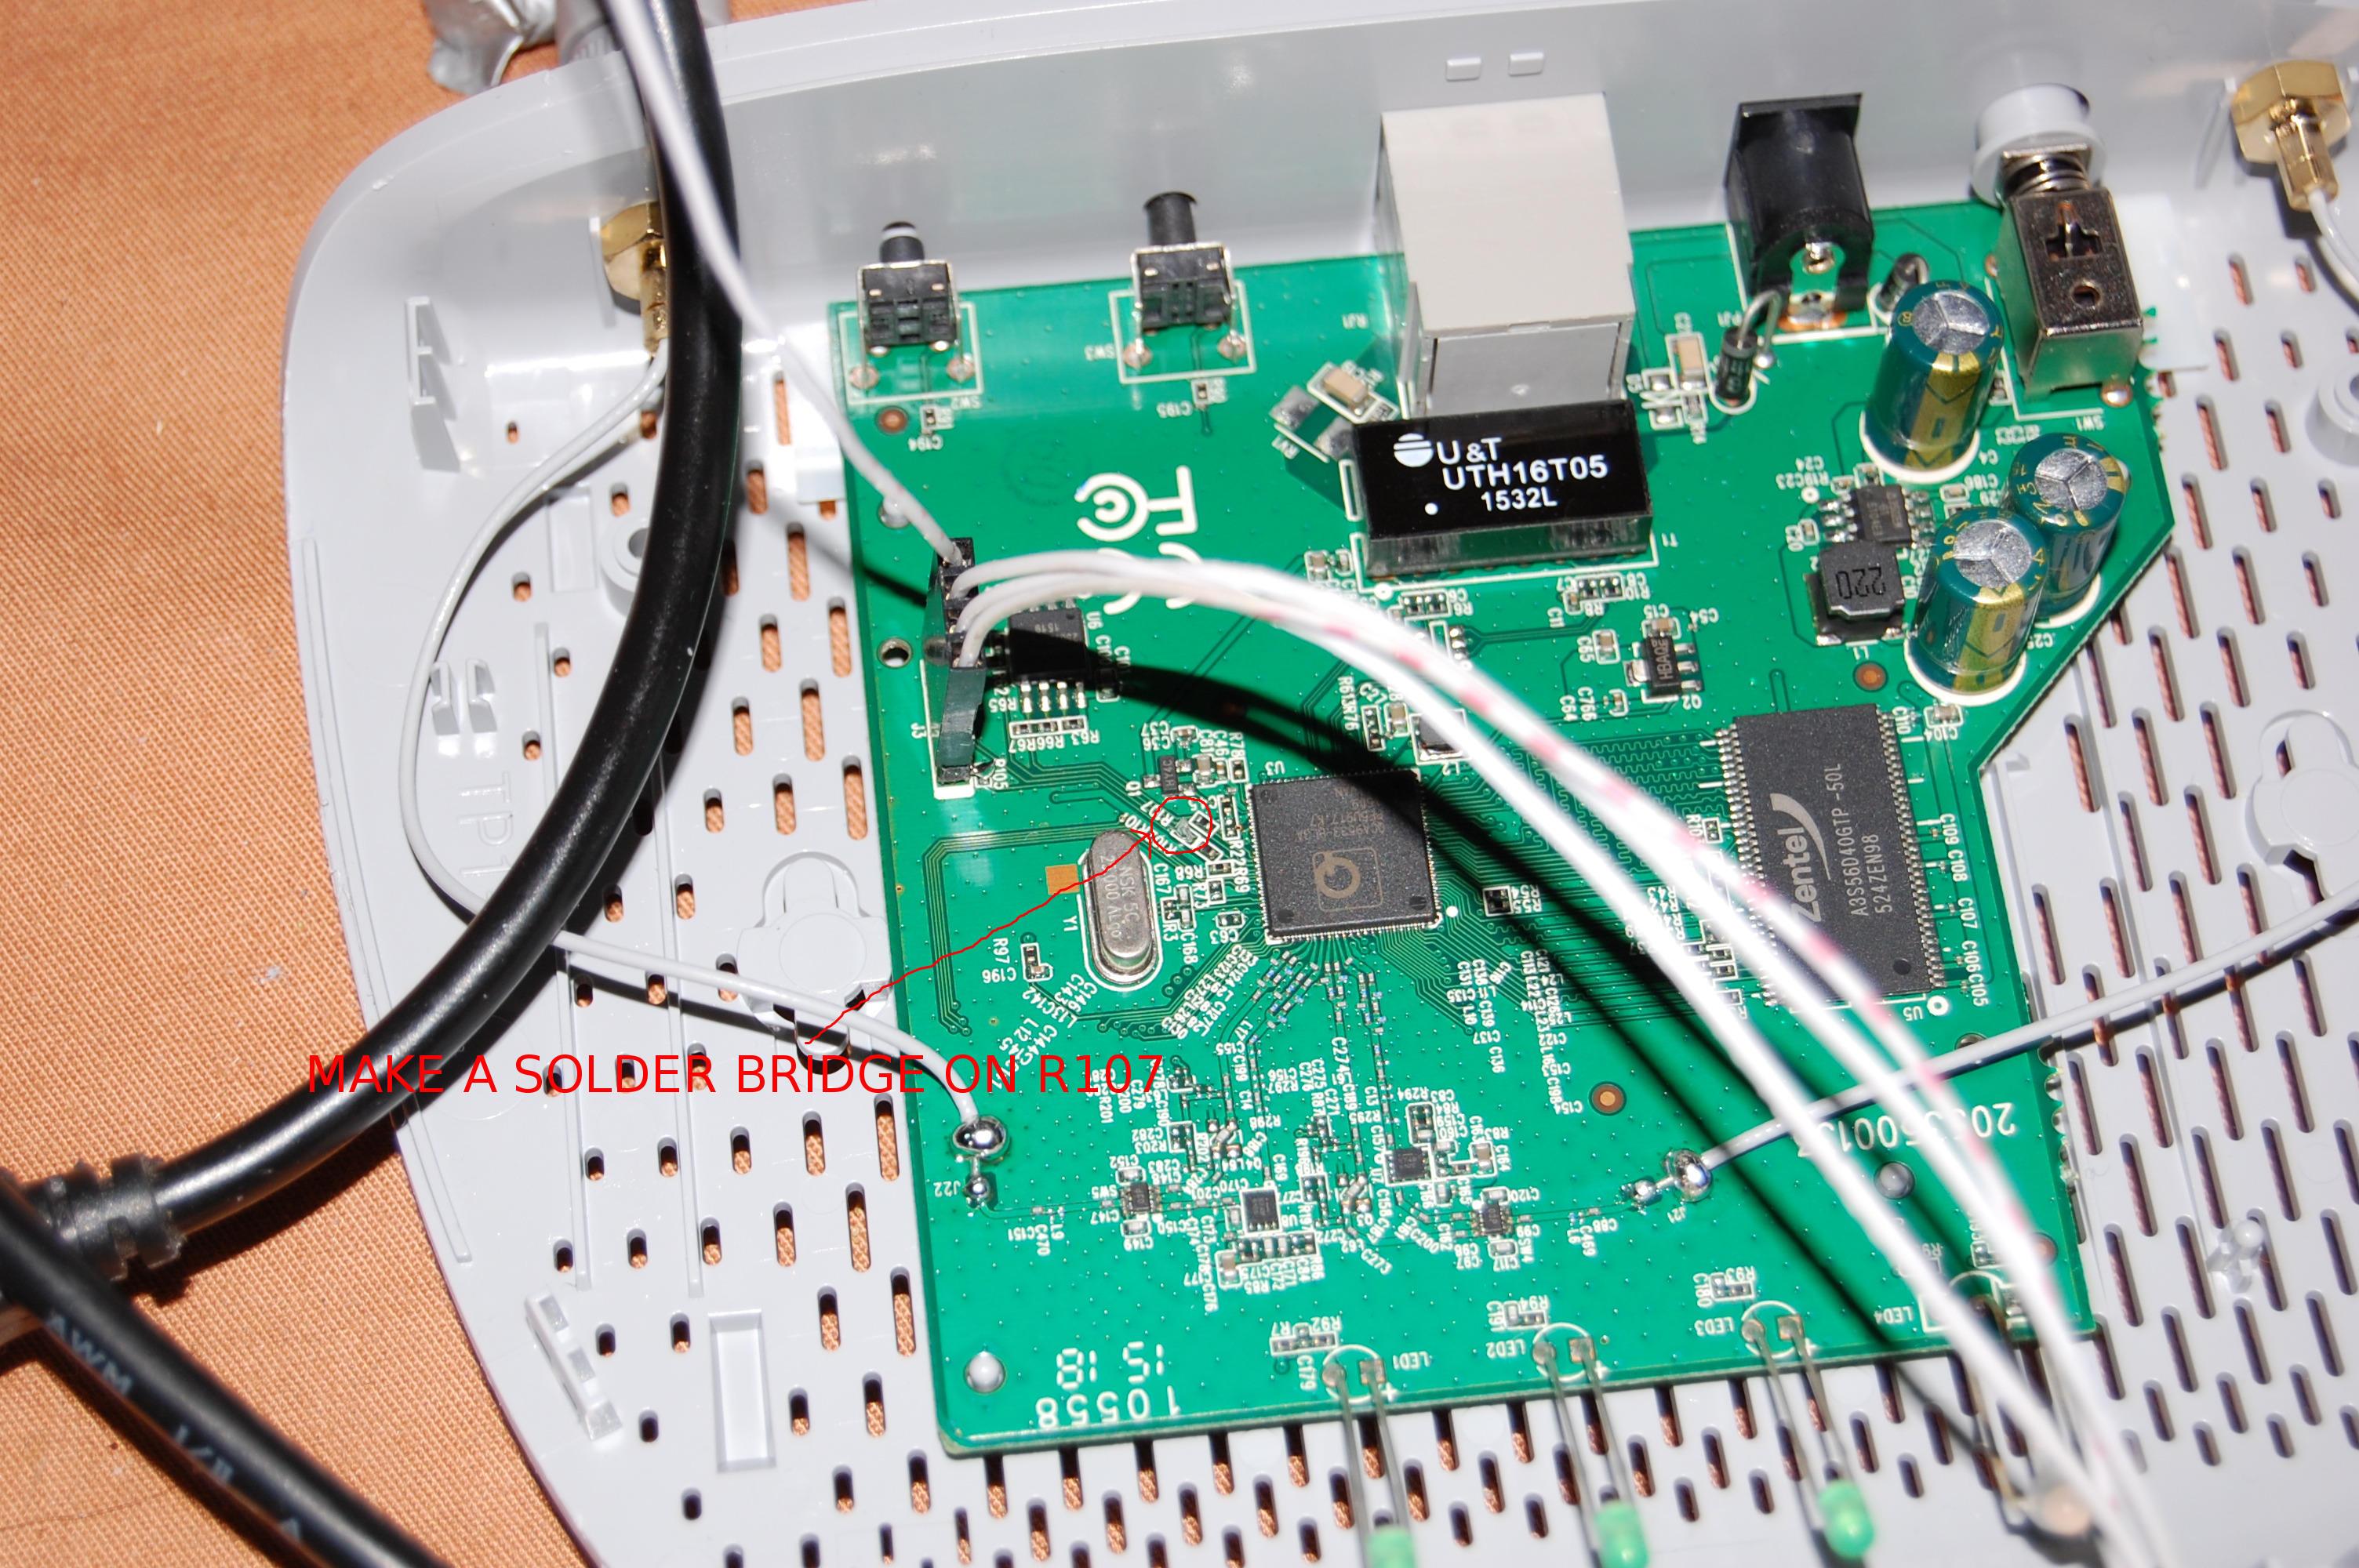 Nanostation Serial Port Crisestudent M2 Wiring Diagram